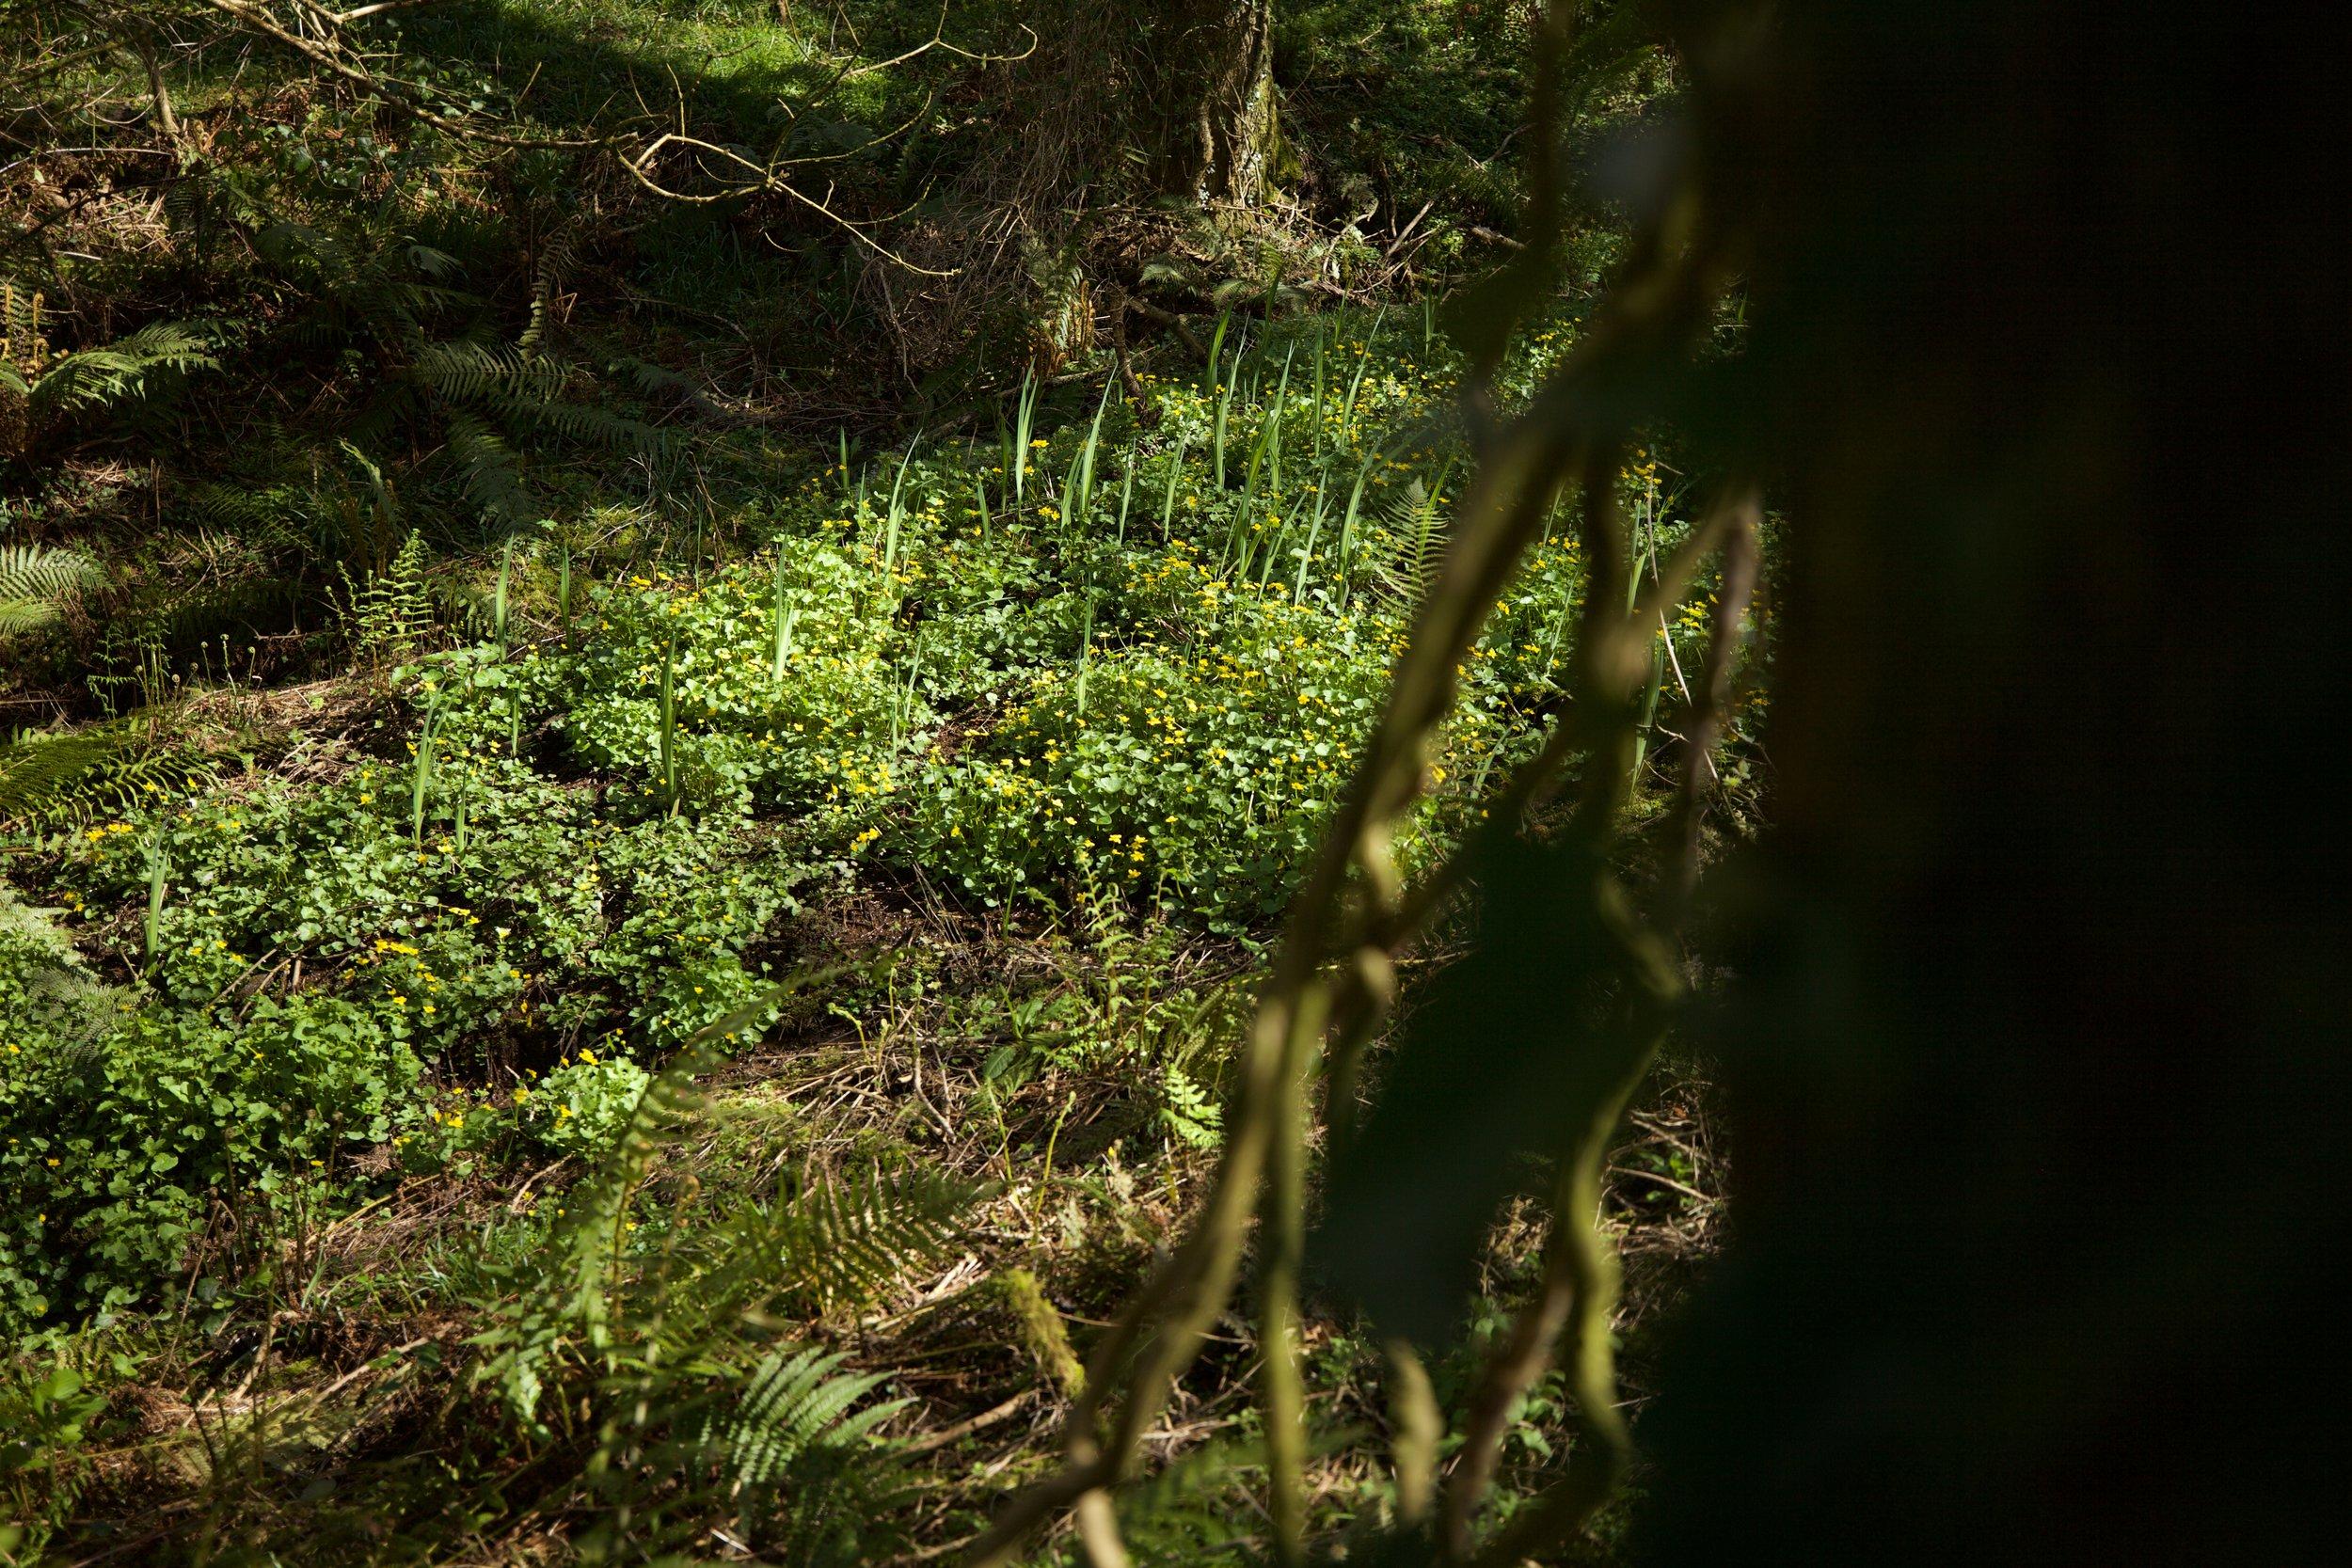 Marsh marigolds in the woods